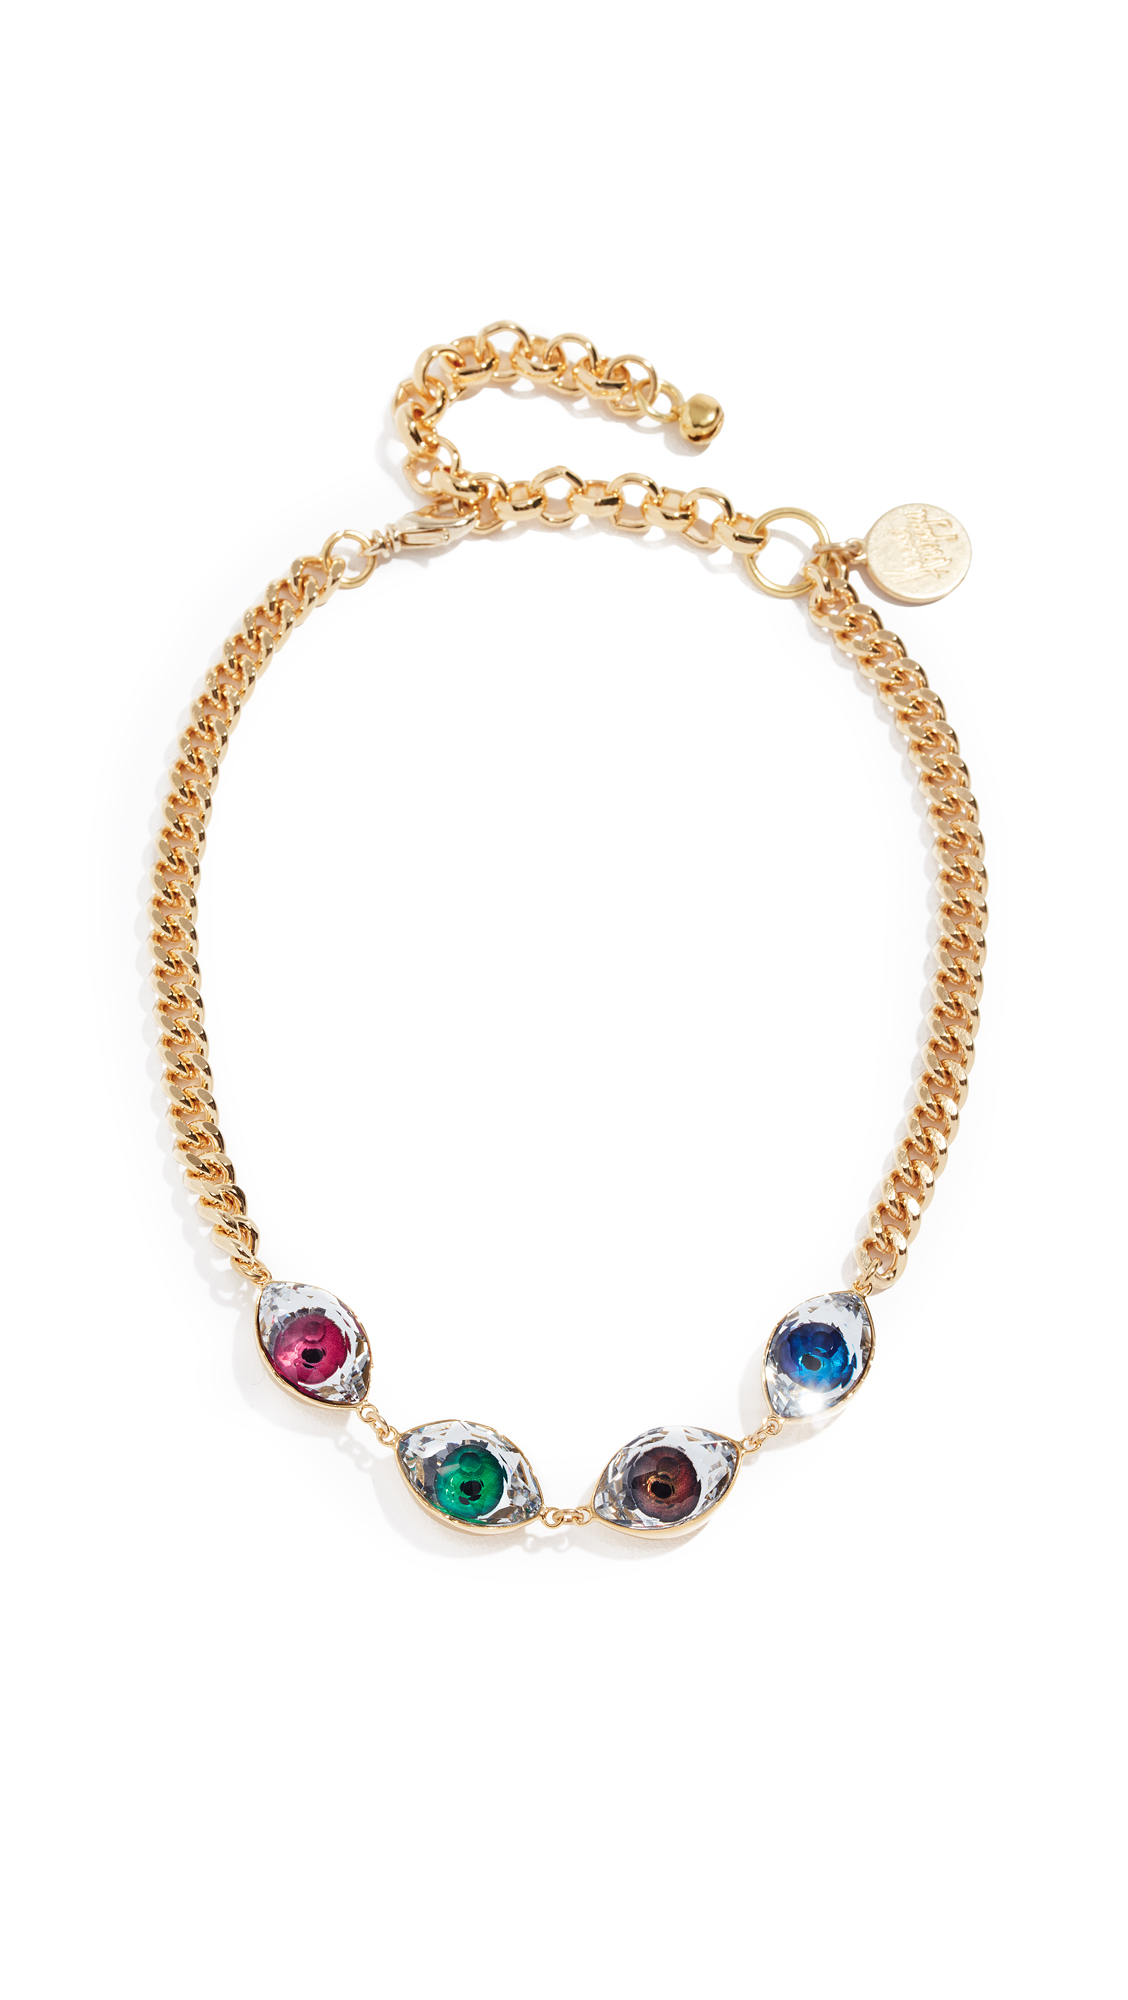 VENESSA ARIZAGA Rainbow Eyes Necklace in Gold/Multi